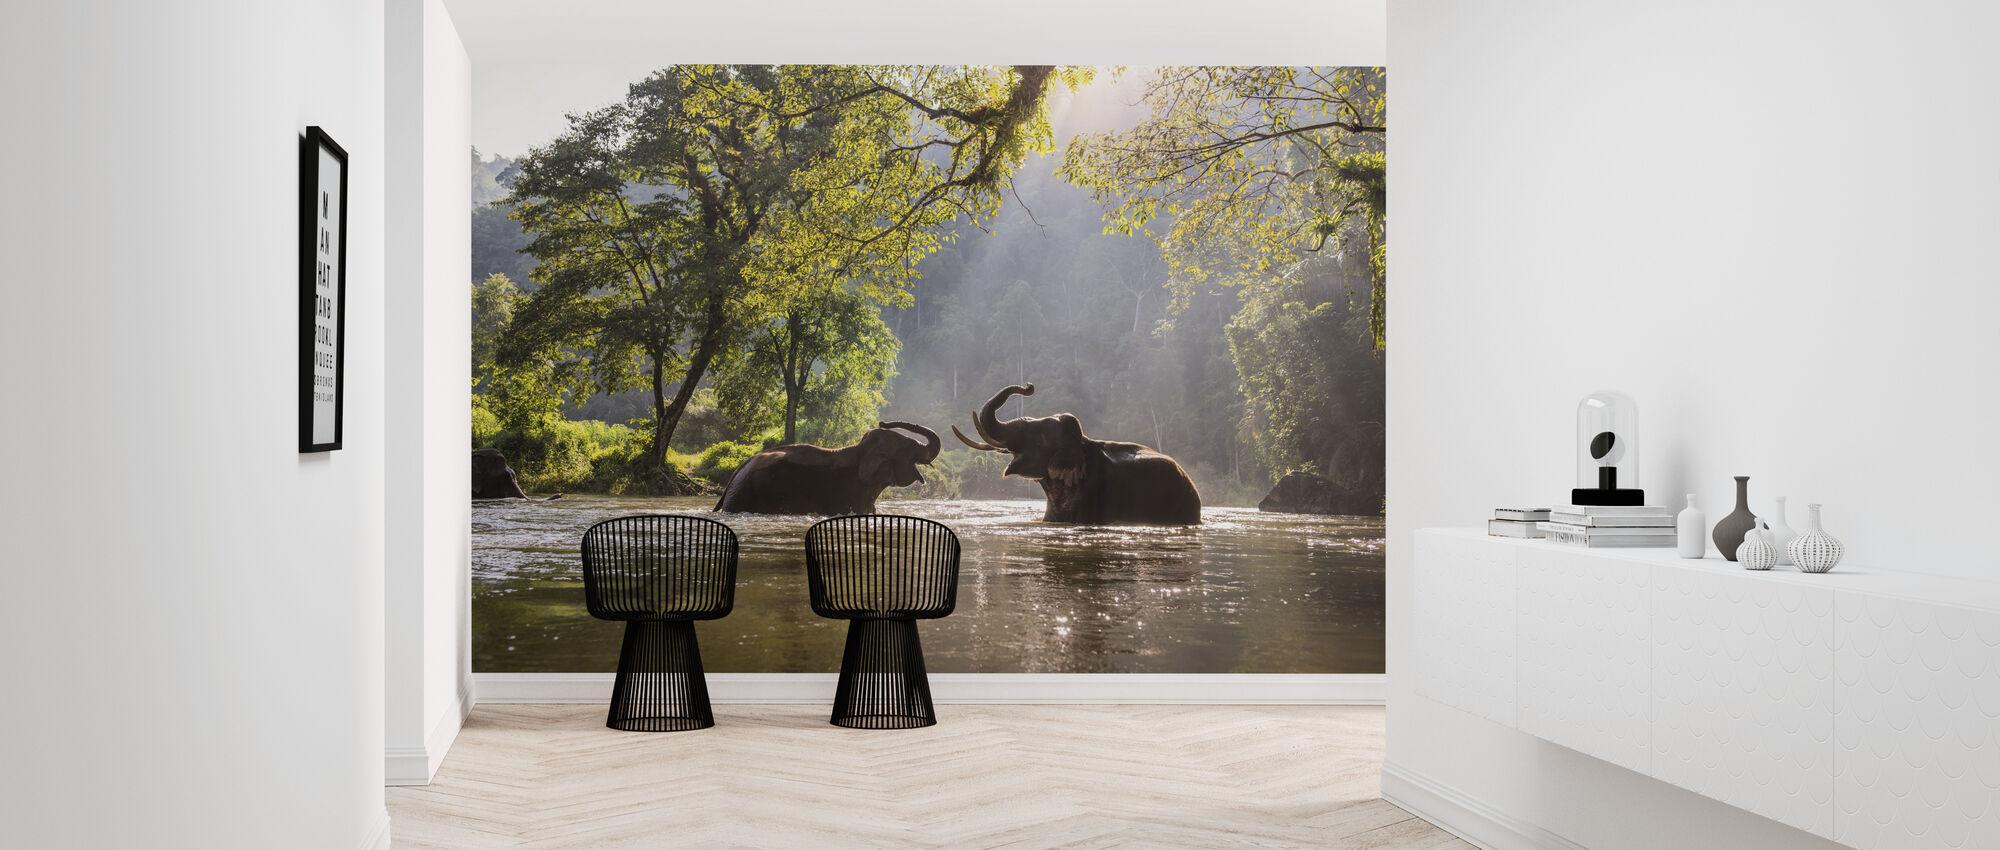 Elephant Playing Water - Wallpaper - Hallway